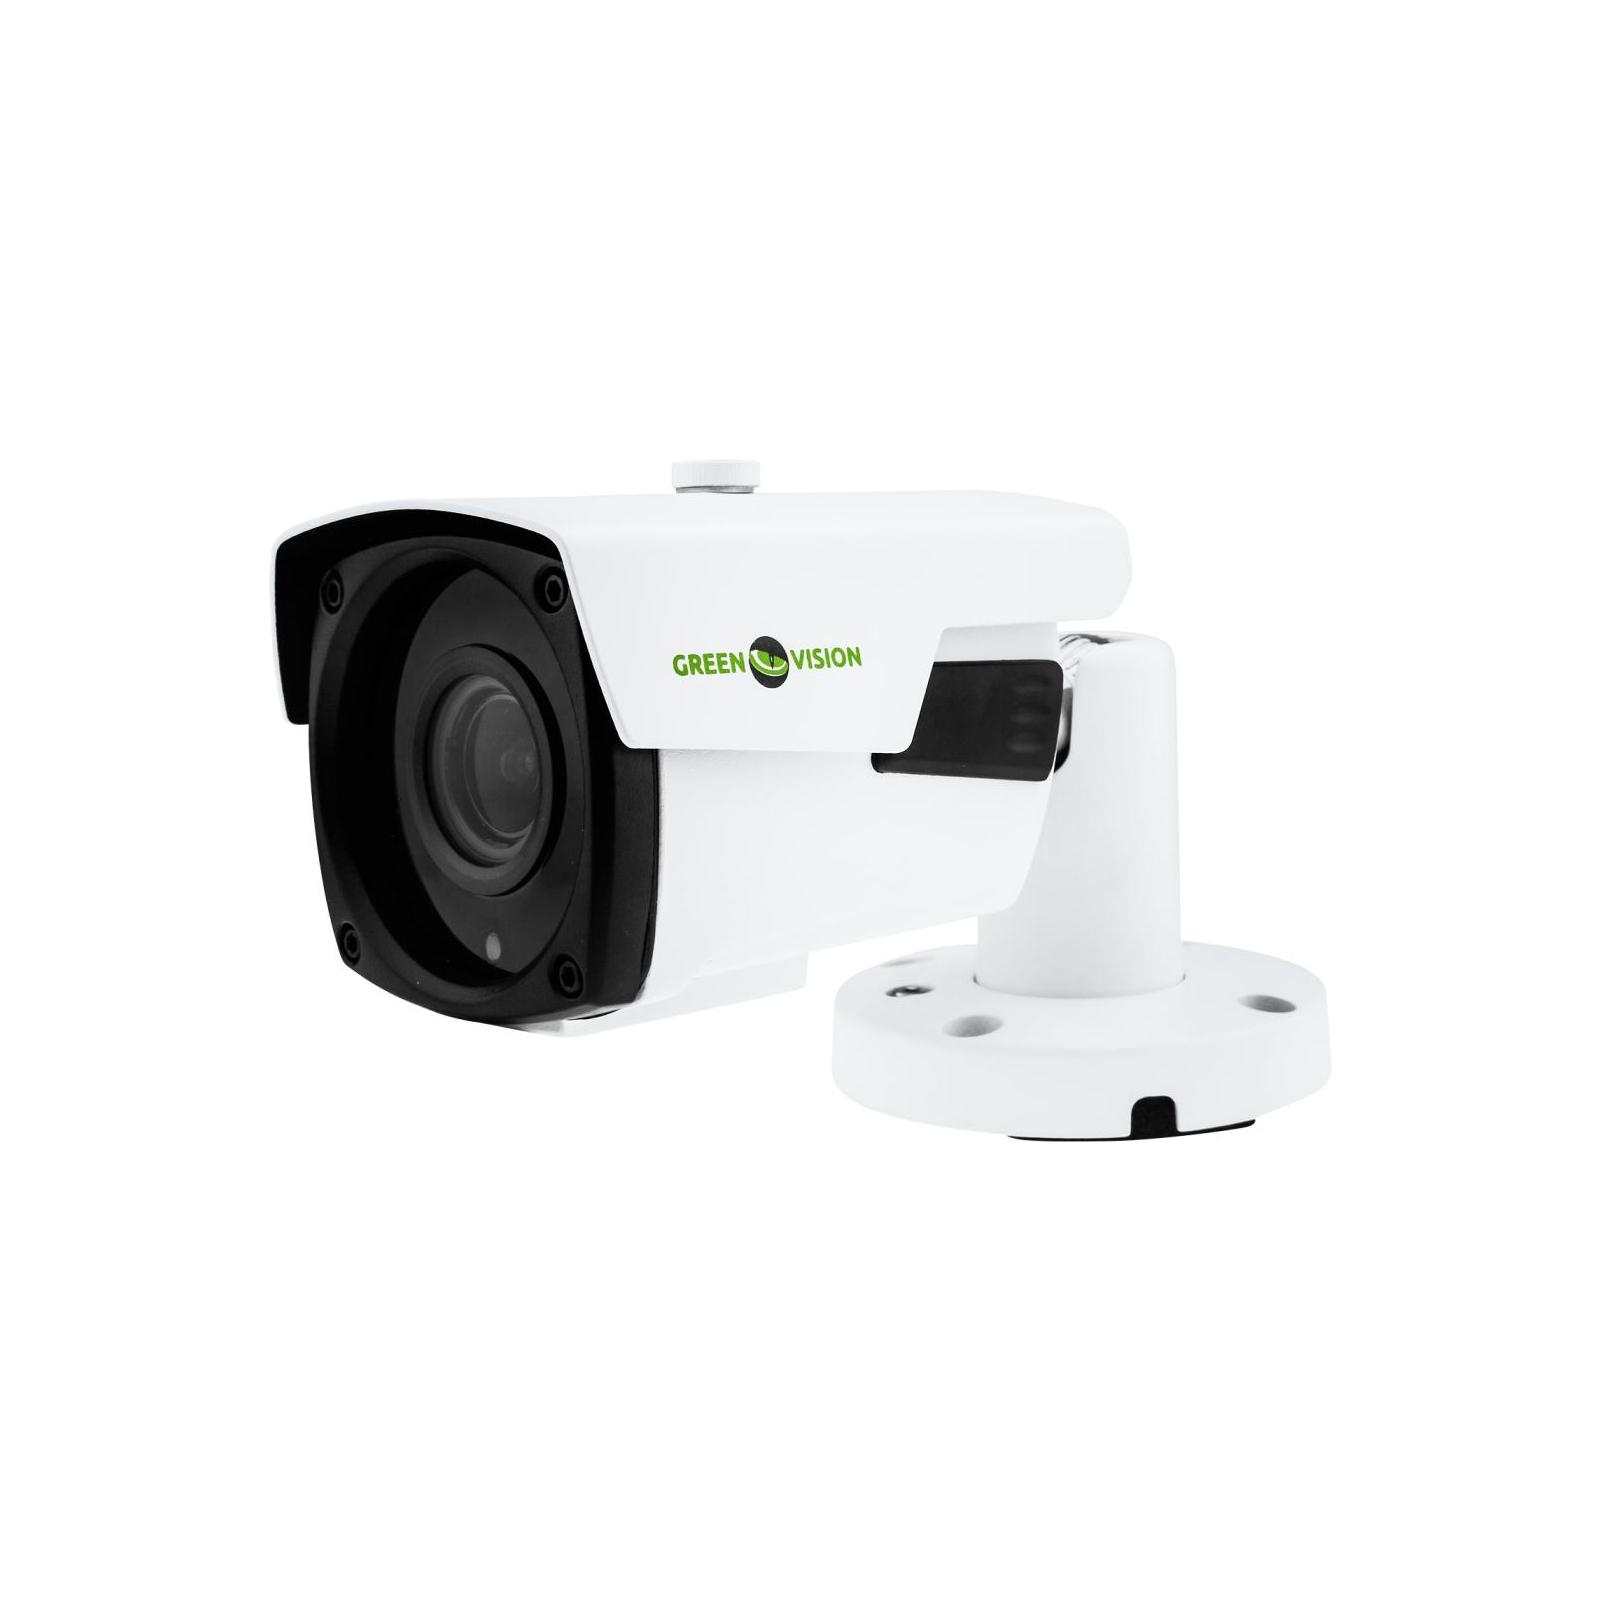 Камера видеонаблюдения Greenvision GV-081-IP-E-COS40VM-40 (6629)